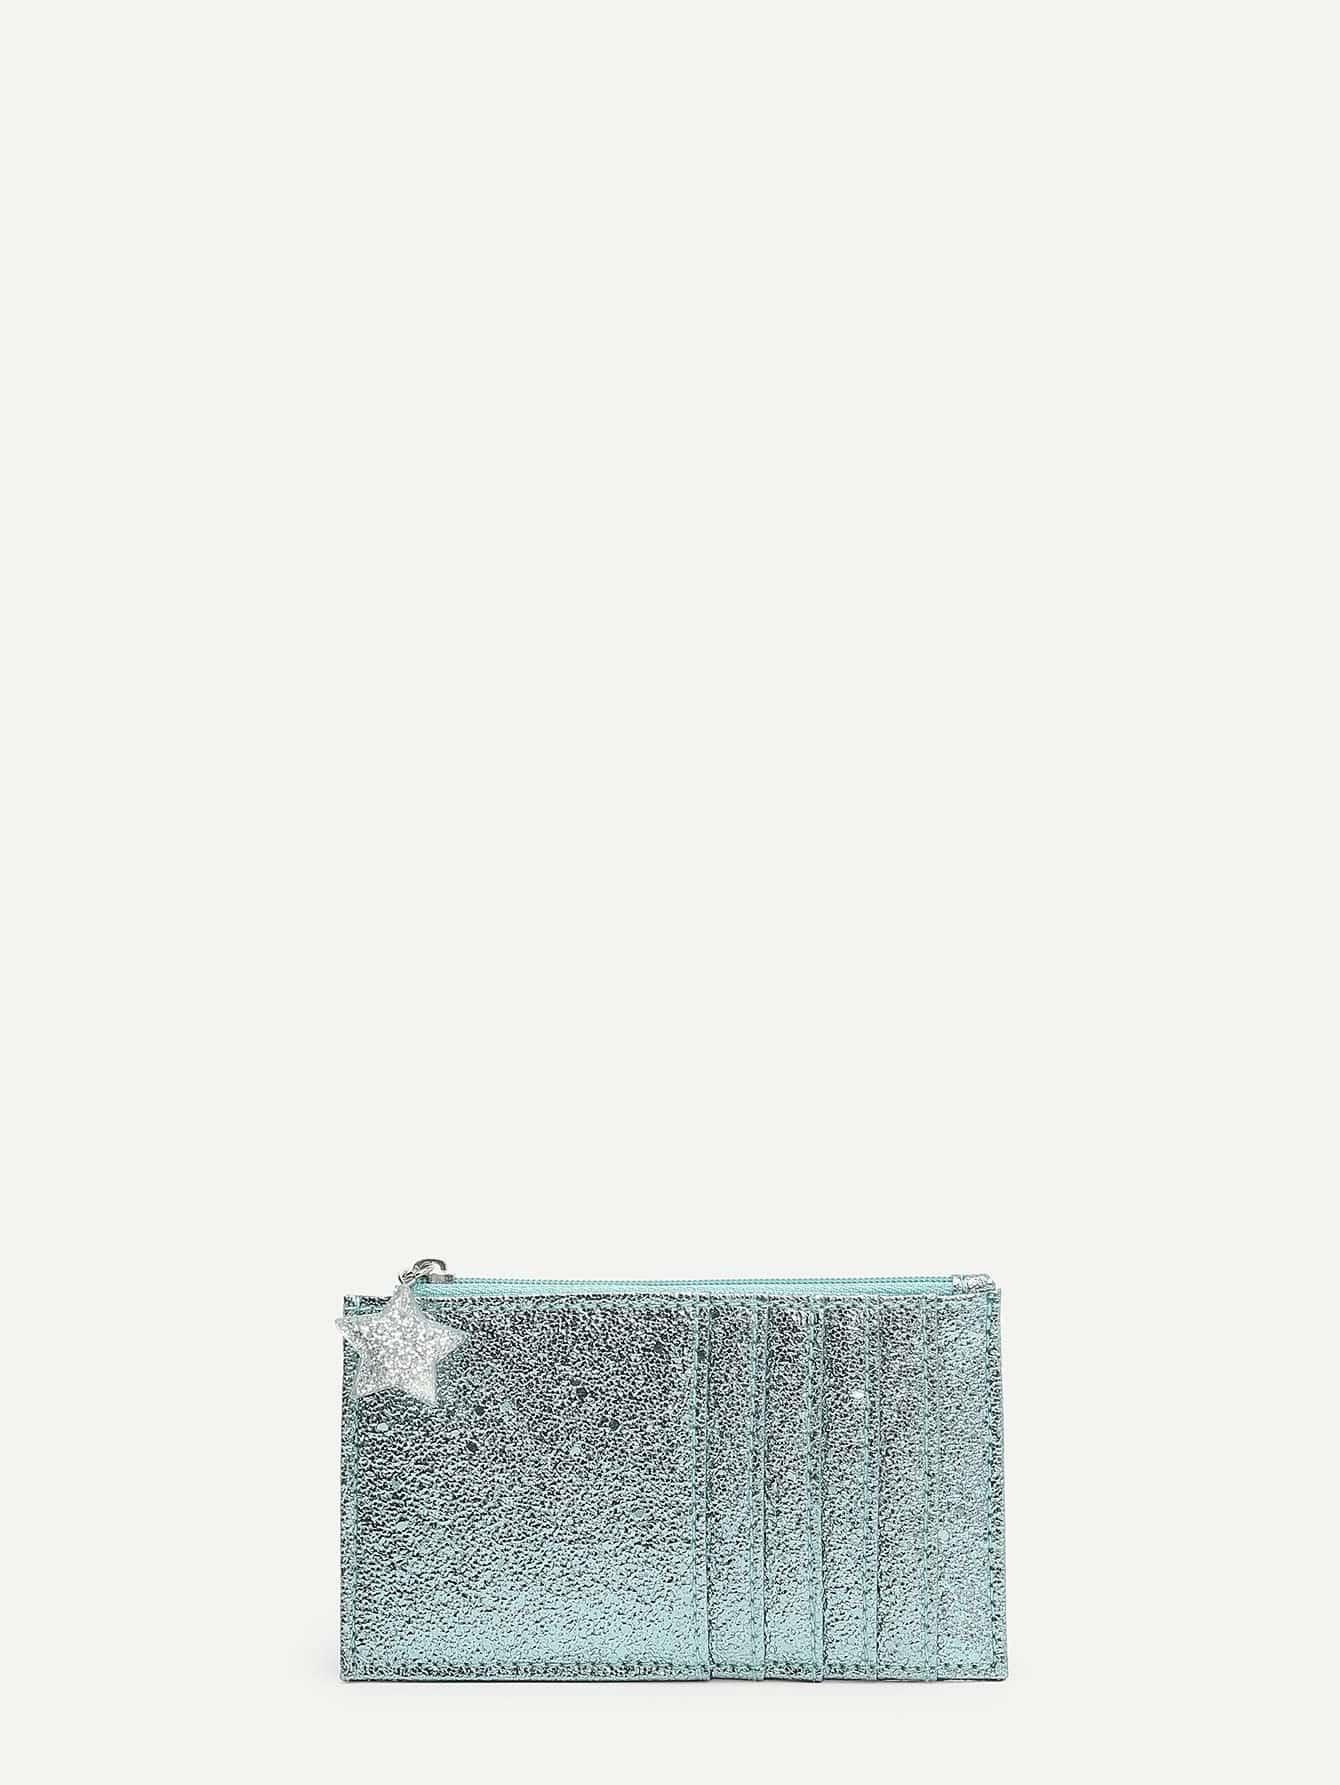 Metallic PVC Card Pouch cmyk offset printing metallic membership vip card printer magnetic stripe pvc plastic card